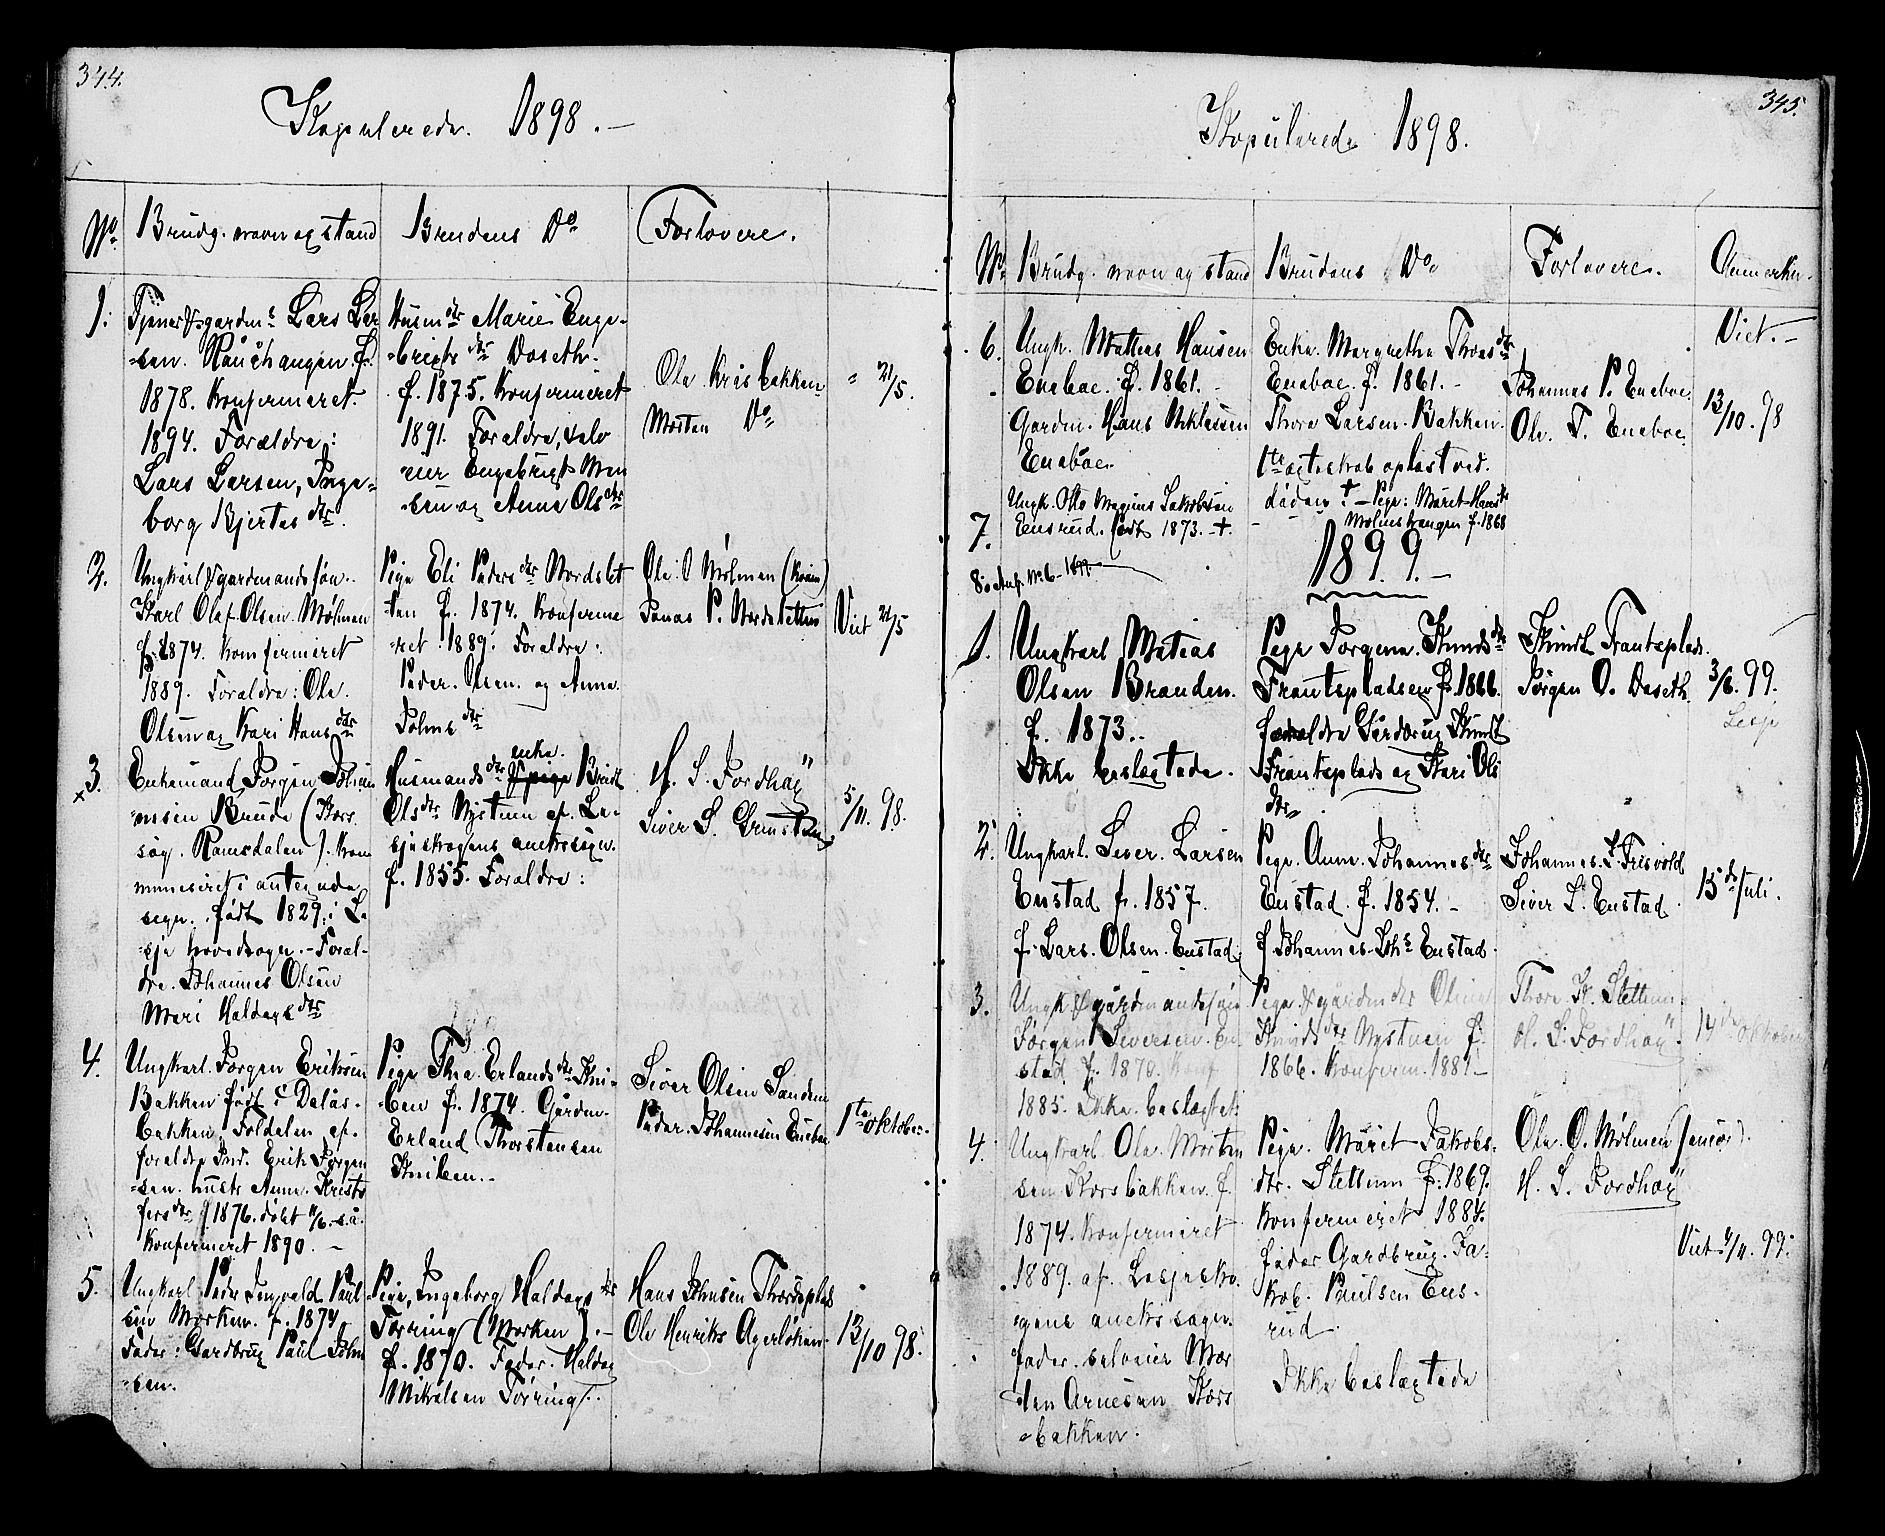 SAH, Lesja prestekontor, Klokkerbok nr. 6, 1871-1904, s. 344-345